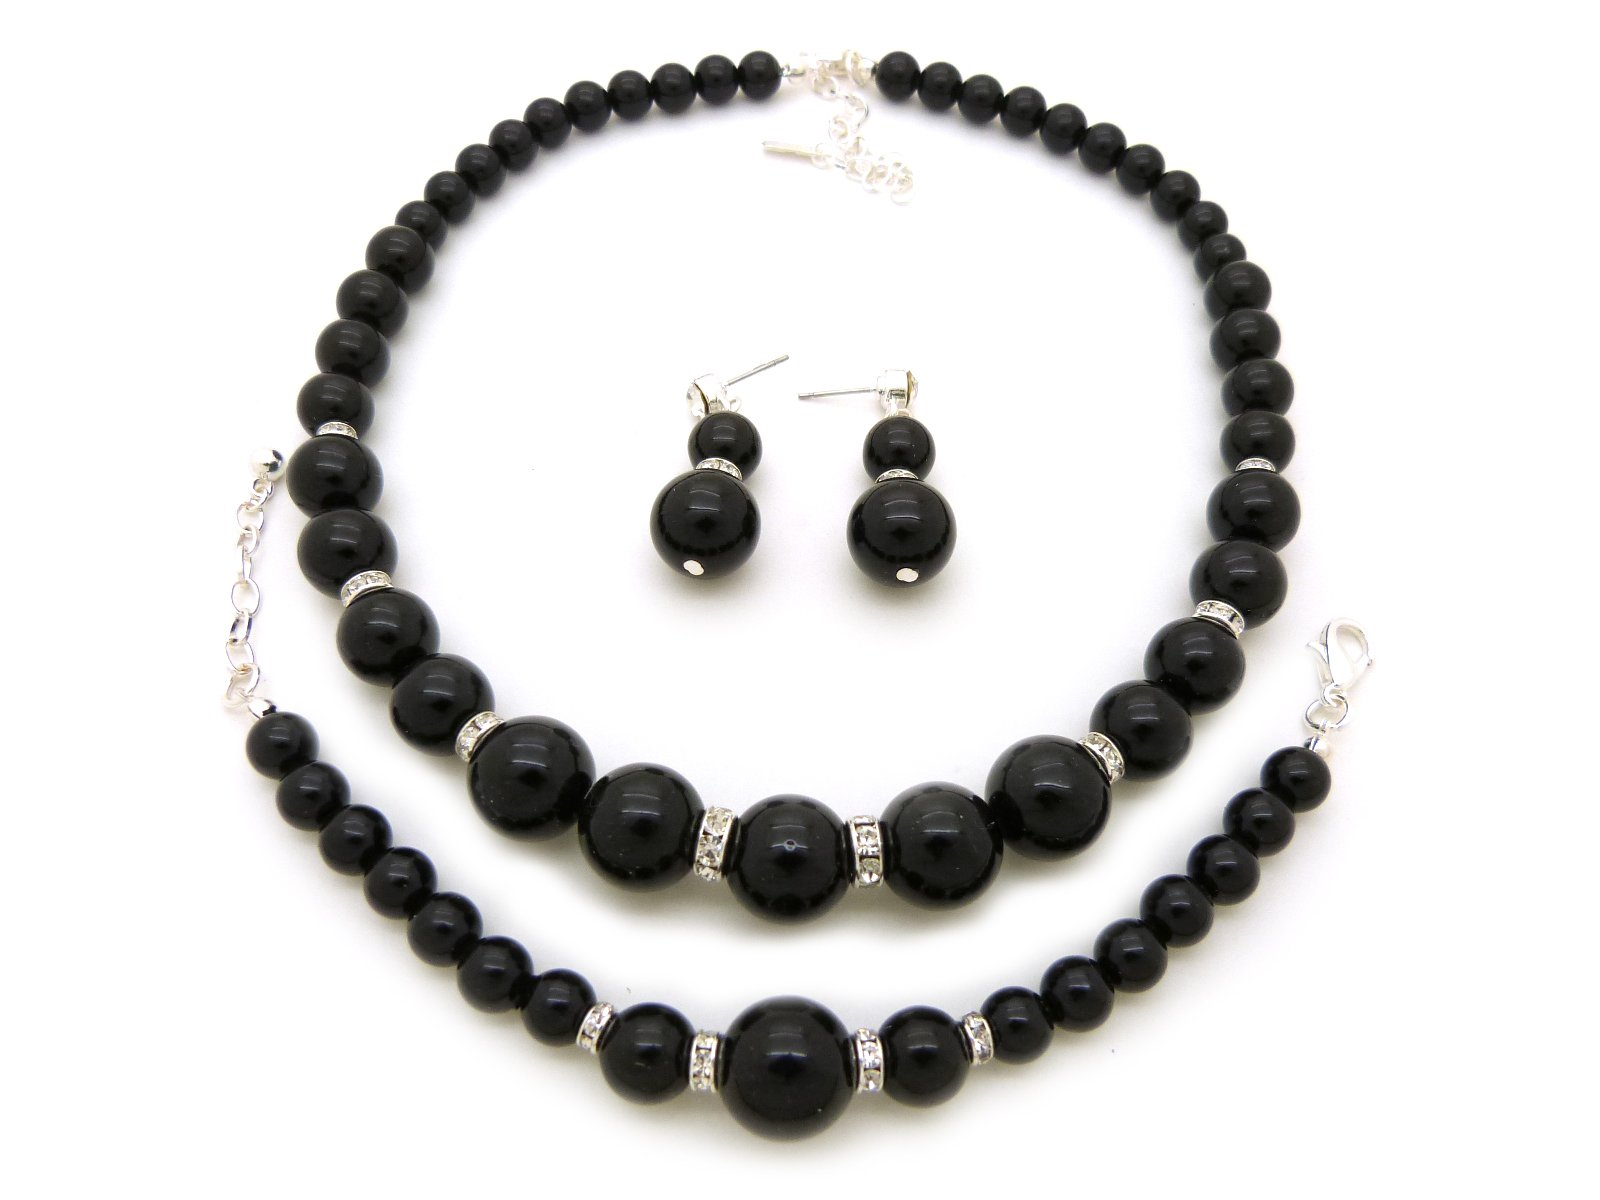 Rhinestone Trimmed Simulated Pearl Necklace, Bracelet, Pierced Earring 3 Set (Black)